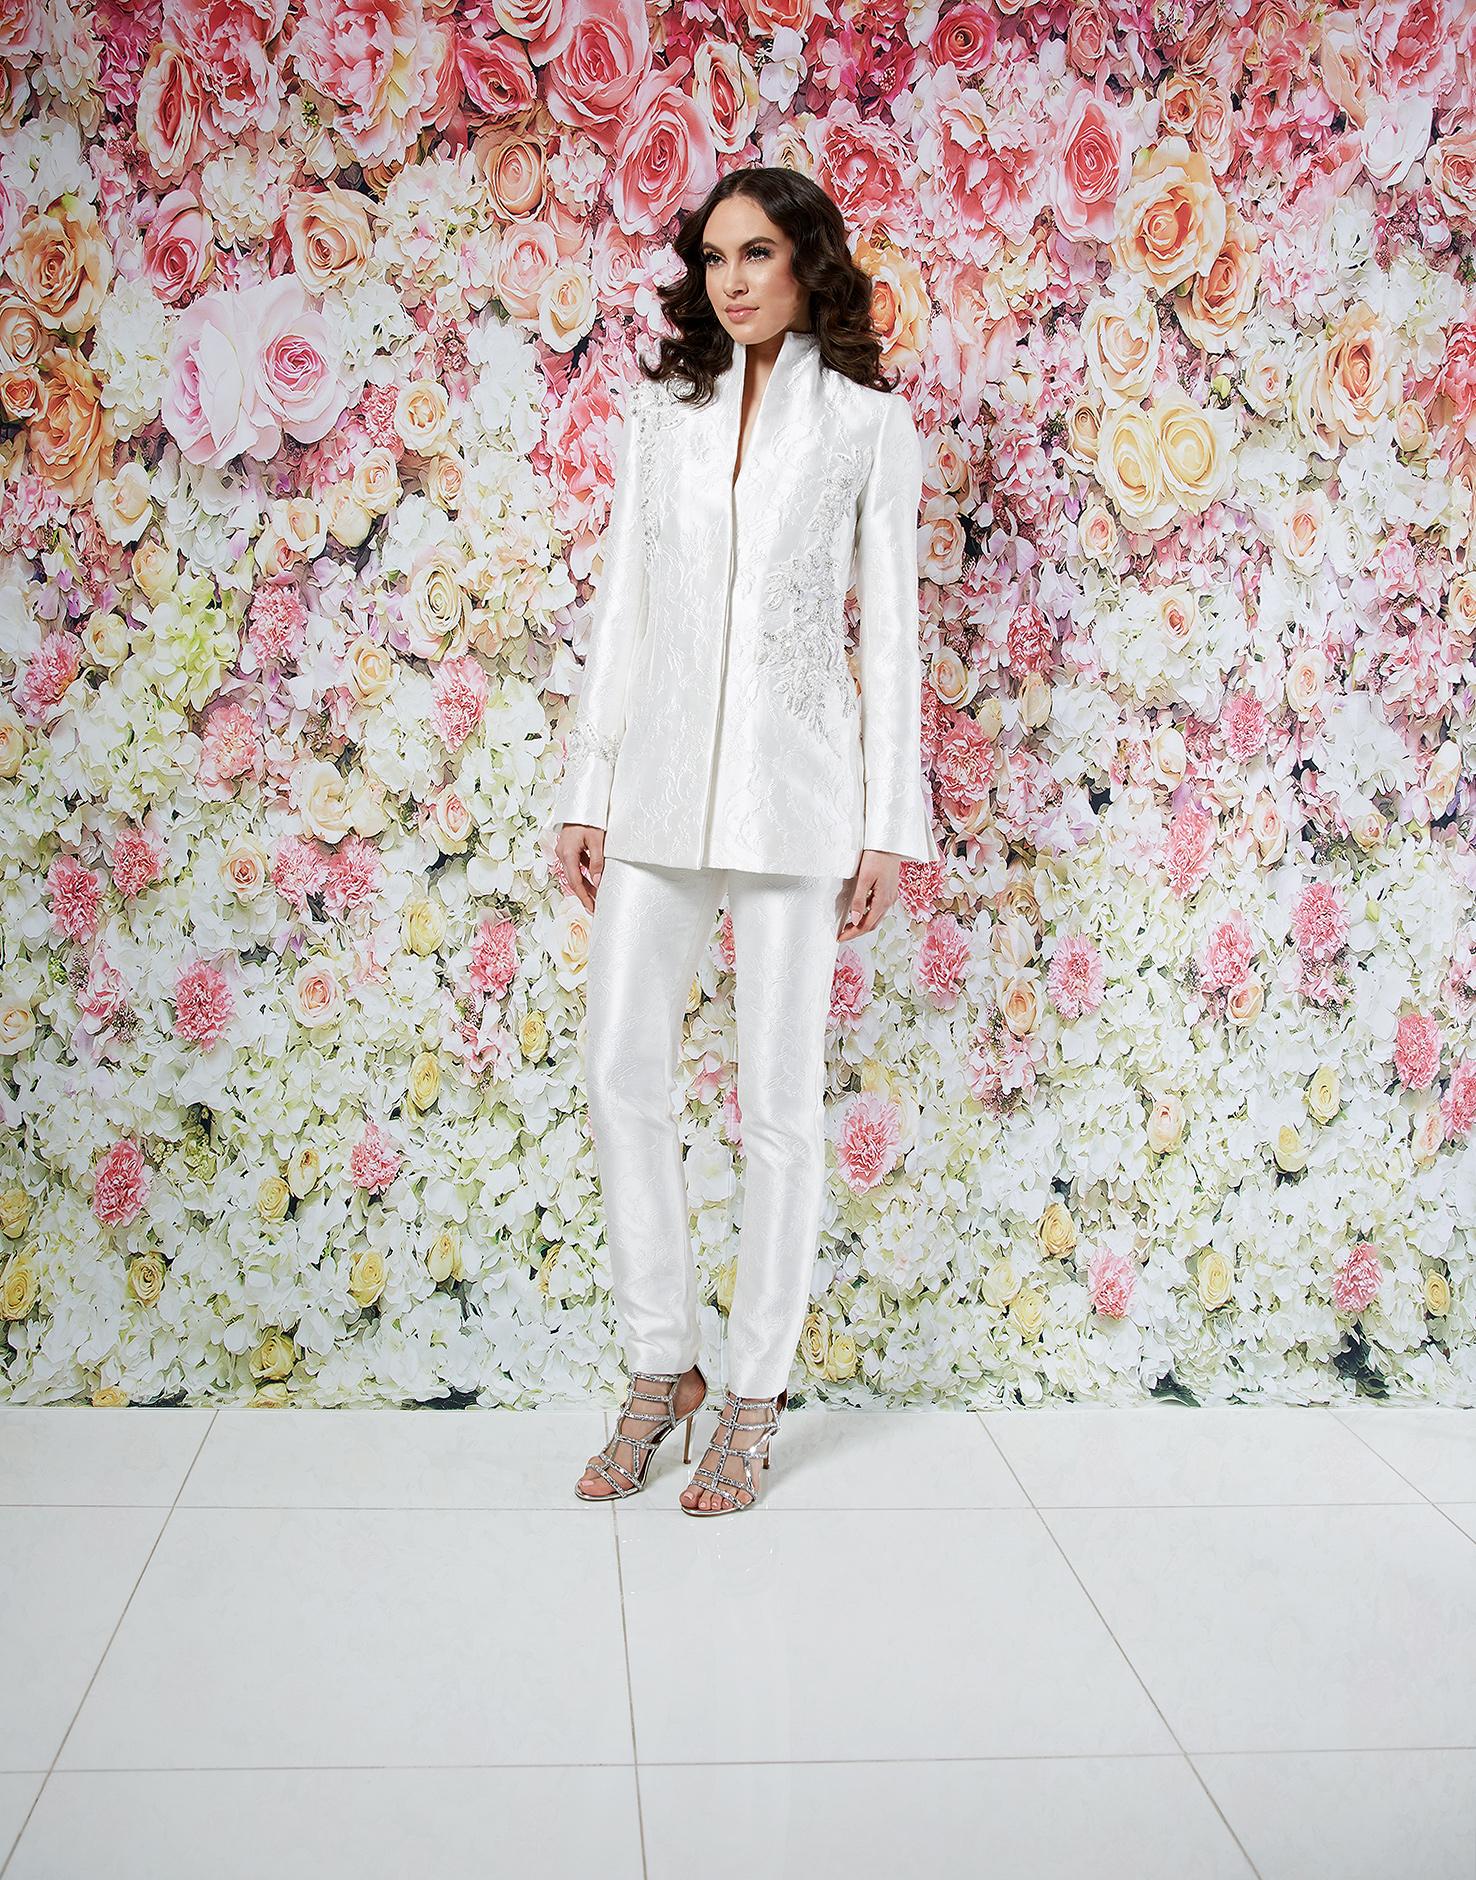 randi rahm wedding dress spring 2019 separates embroidered jacket pants